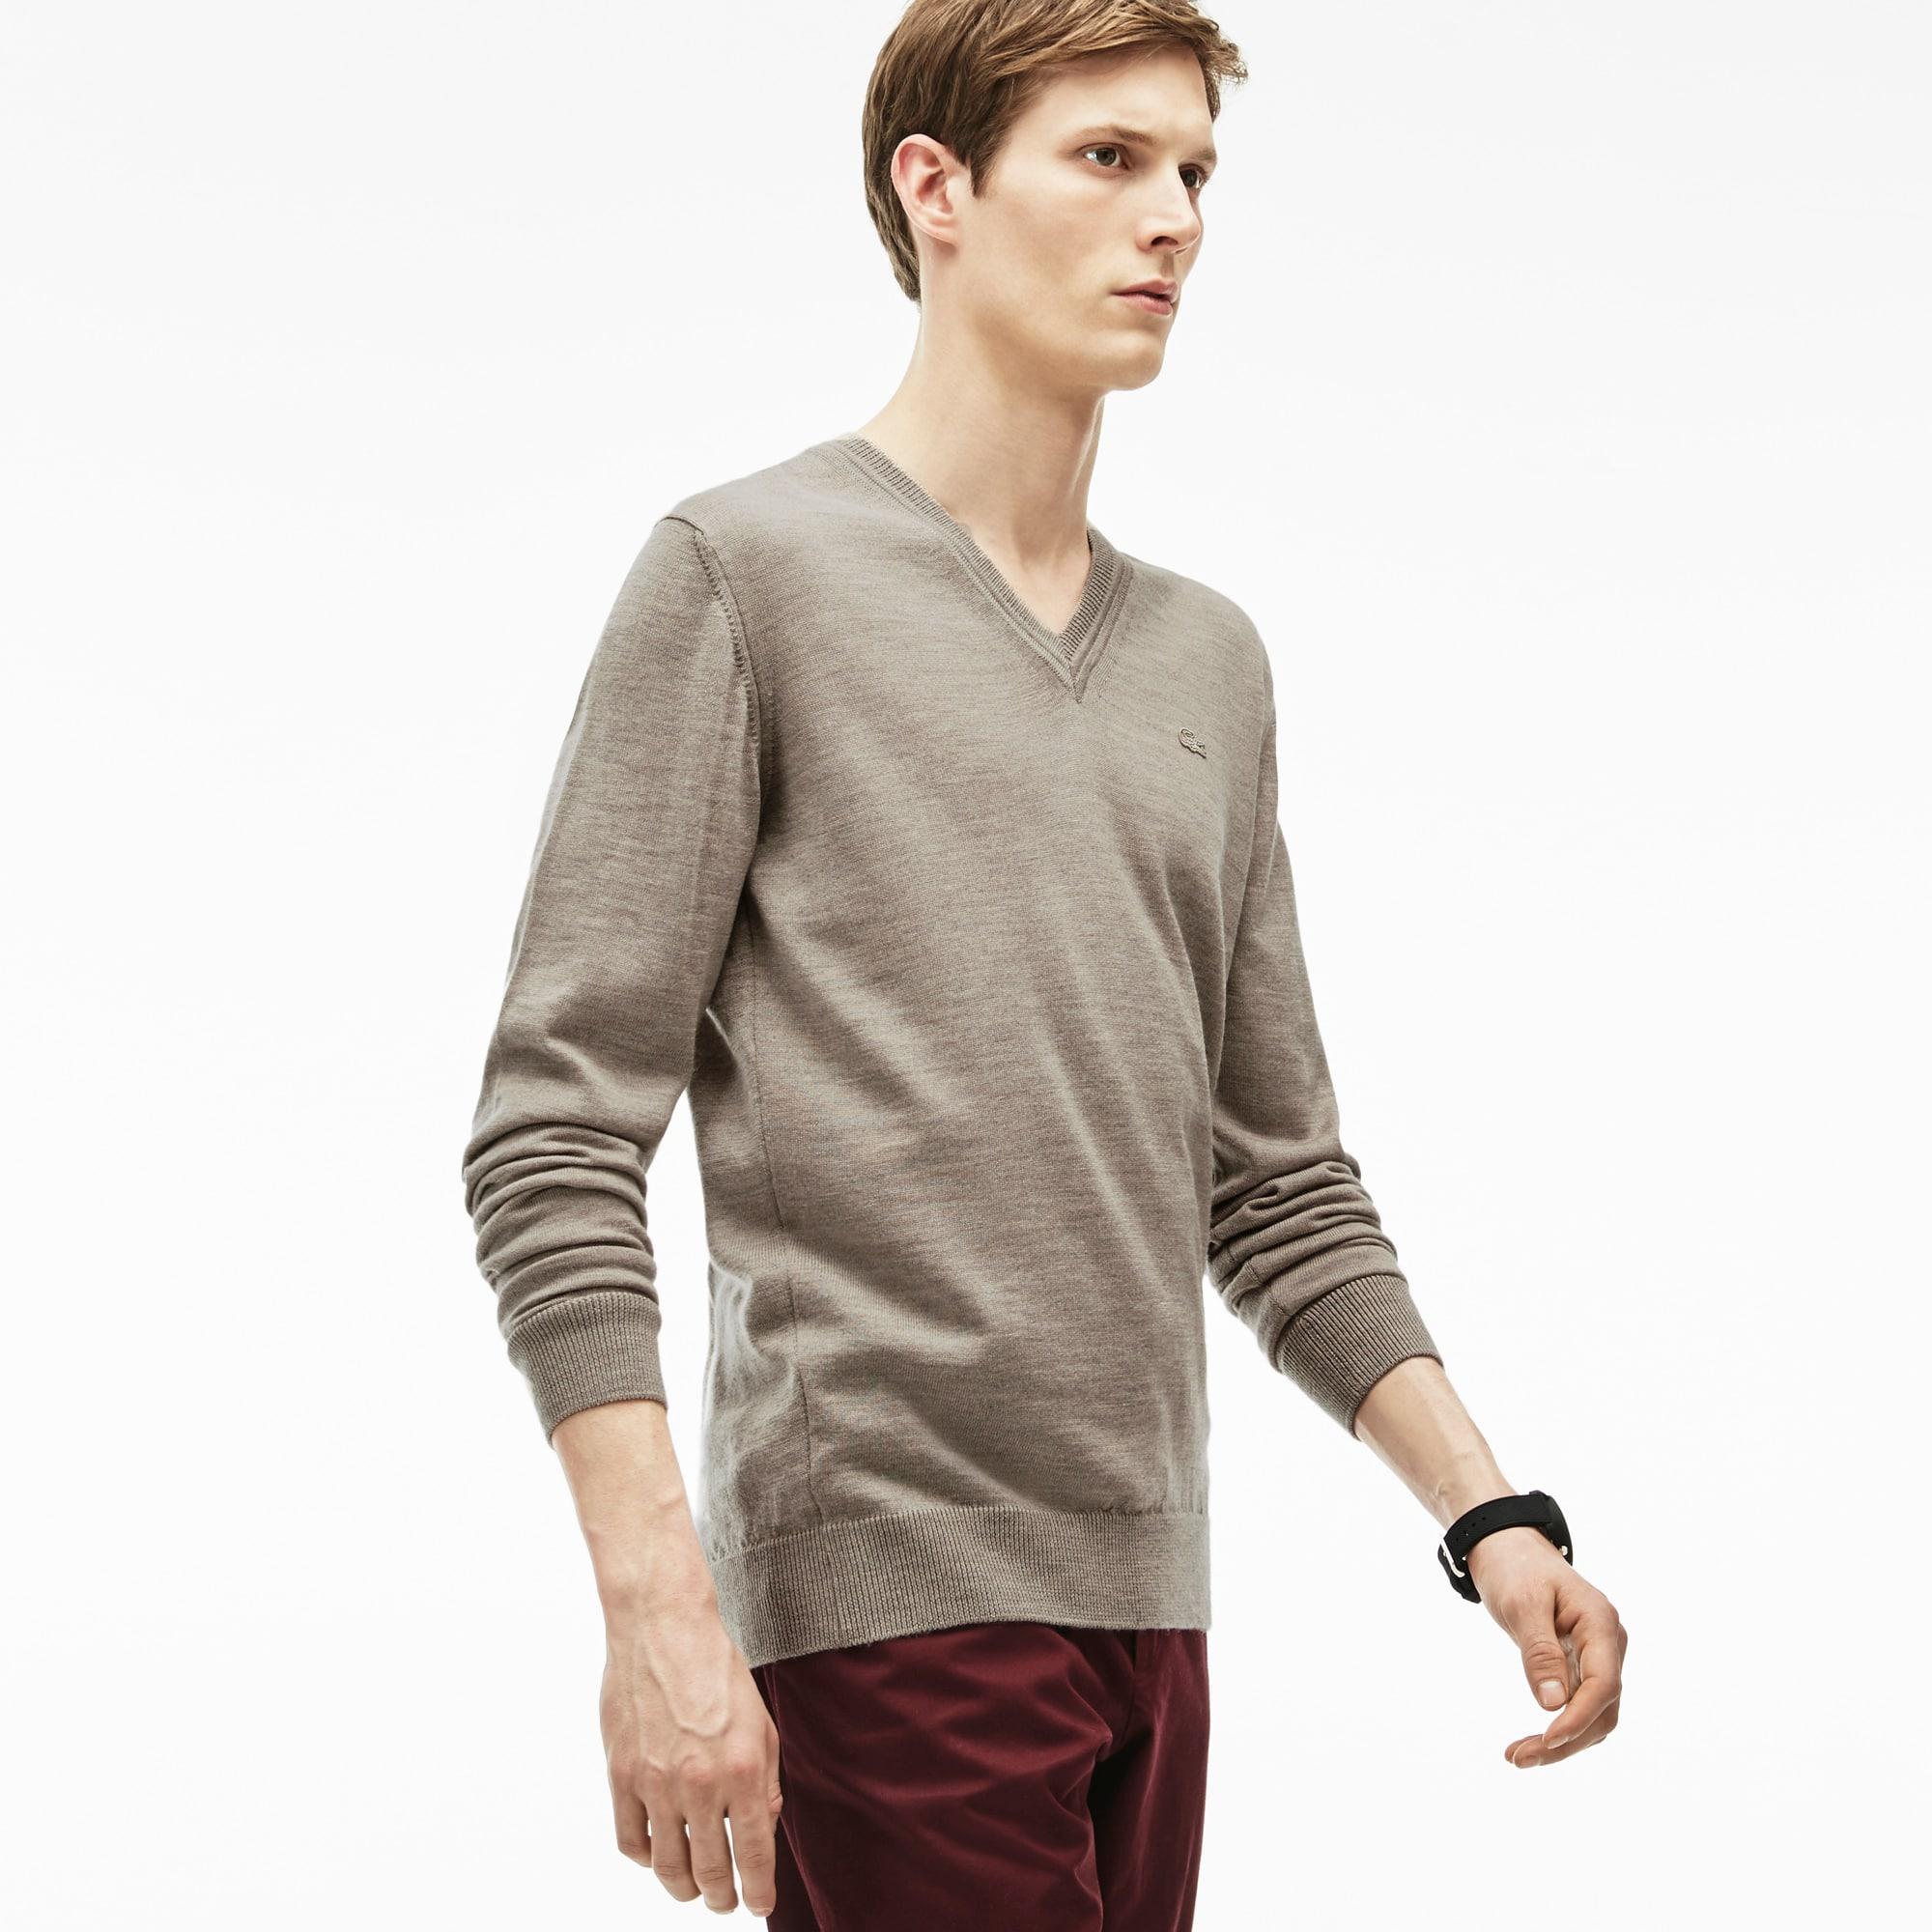 Men's V-neck Wool Jersey Sweater